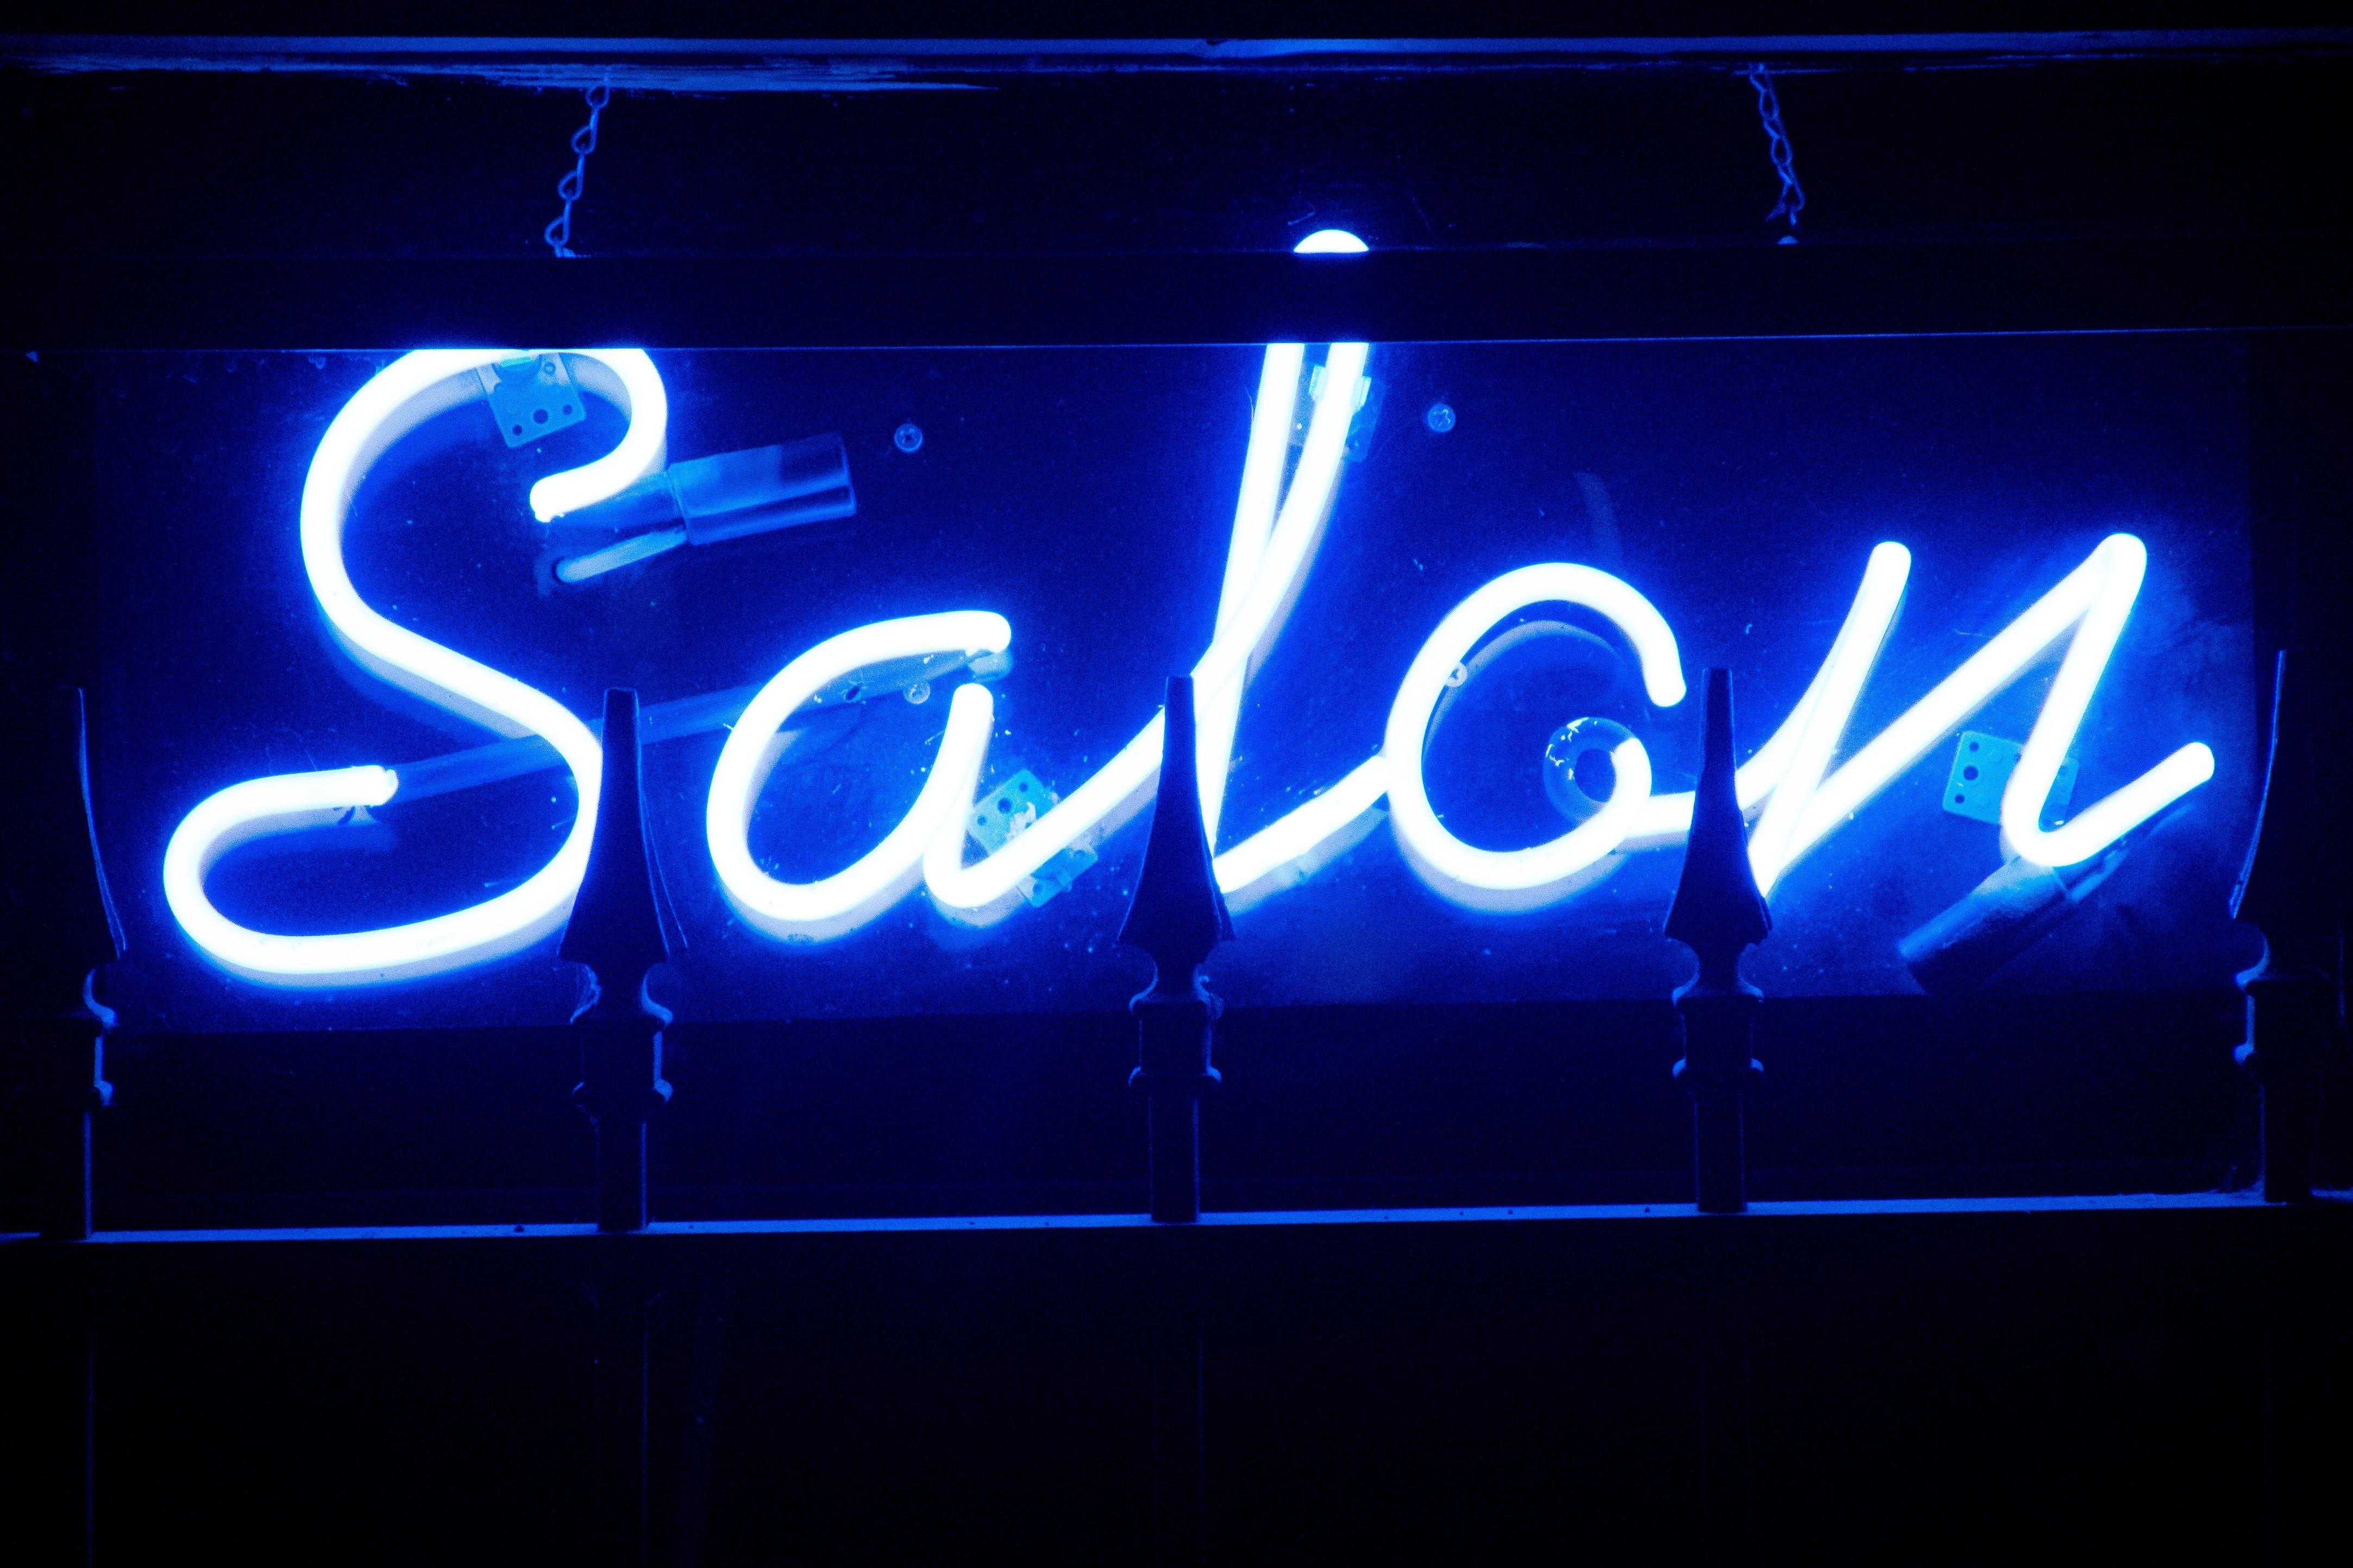 Blue Salon Neon Signage